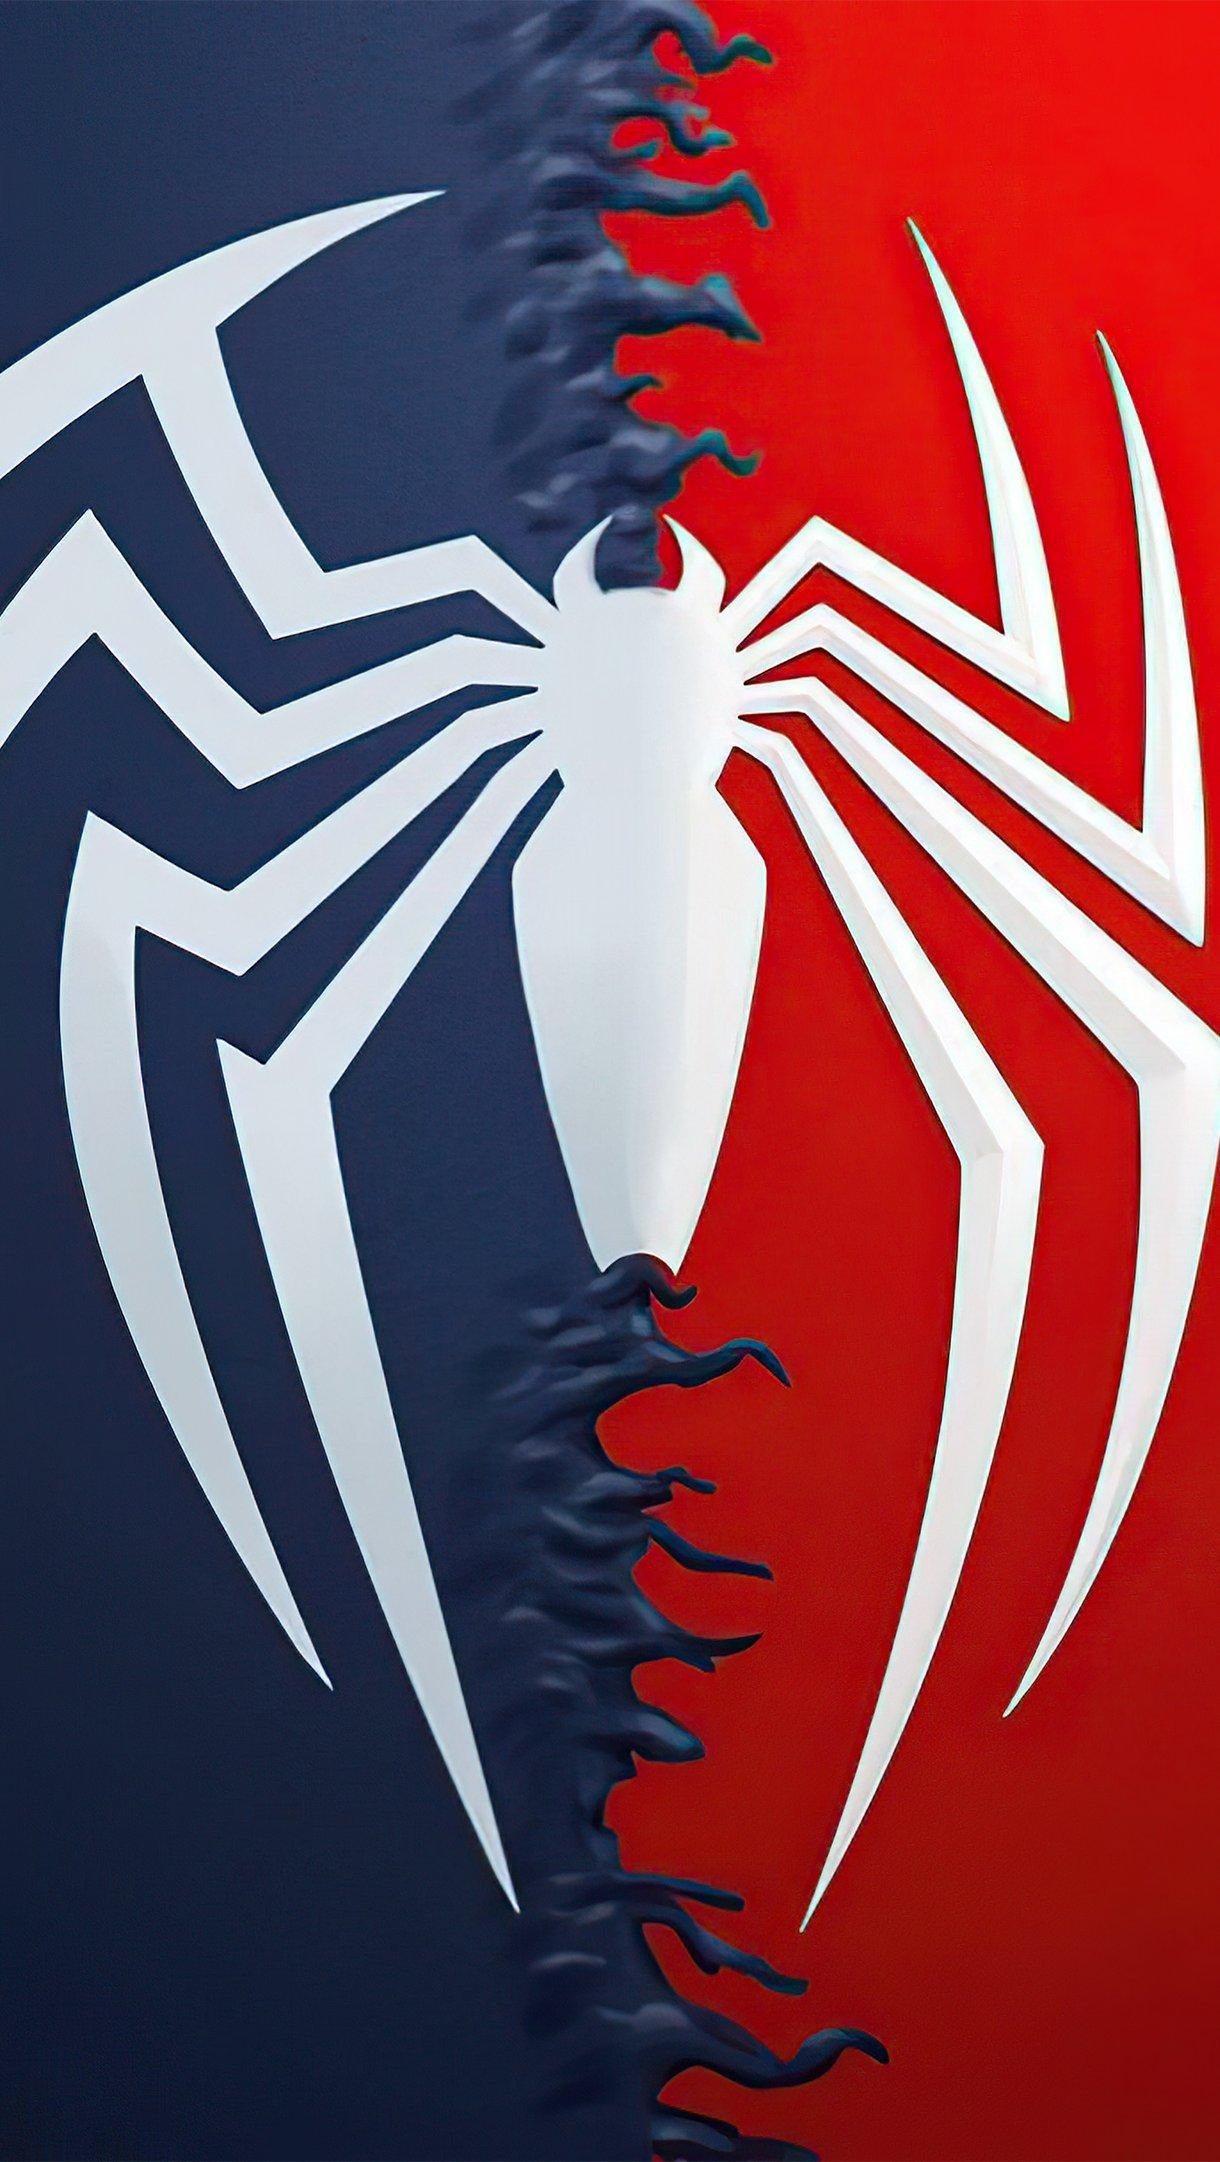 Wallpaper Spiderman Logo Vertical